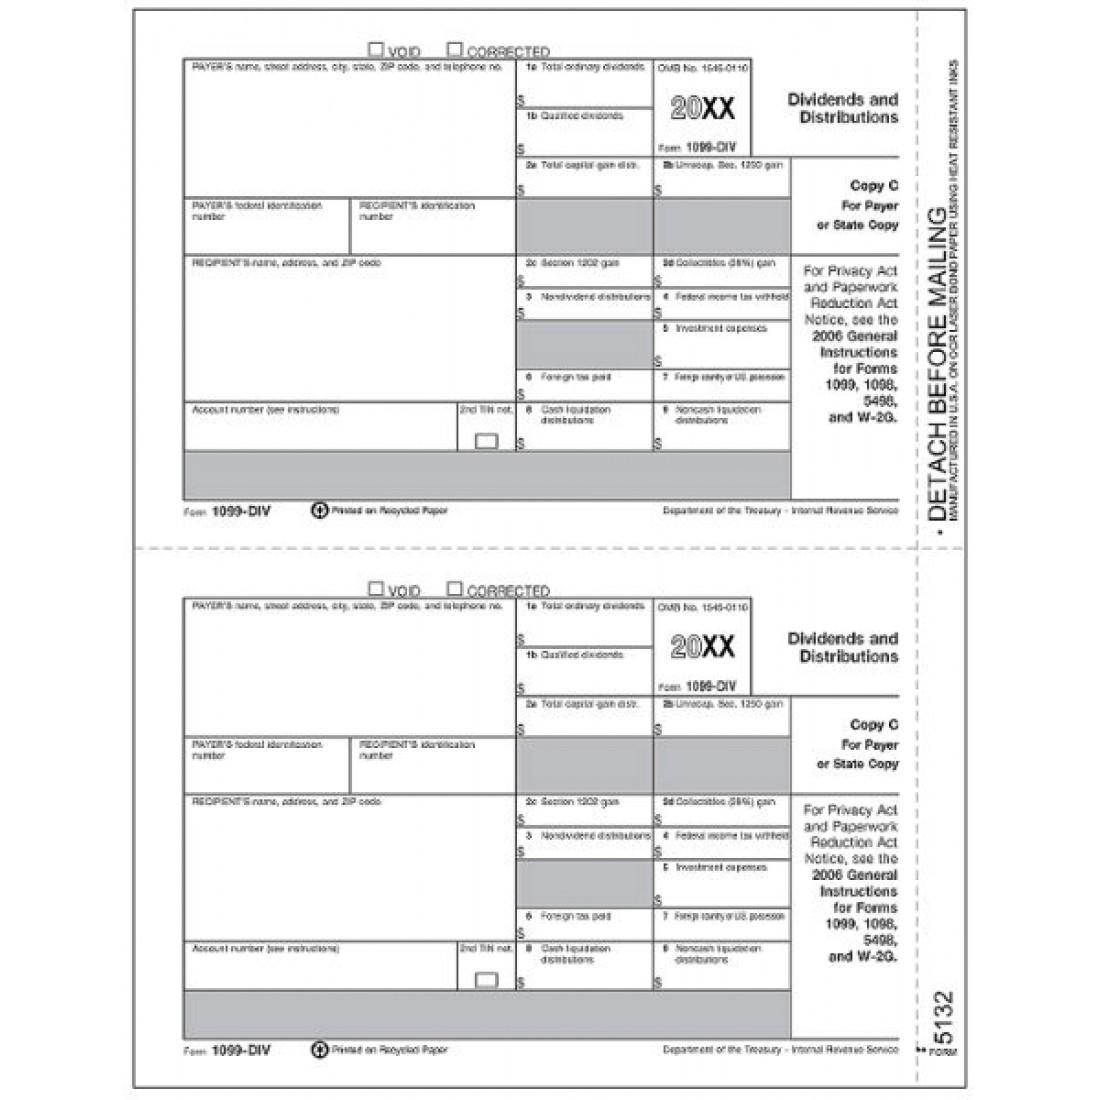 Laser 1099 DIV Income, State Copy C, Bulk